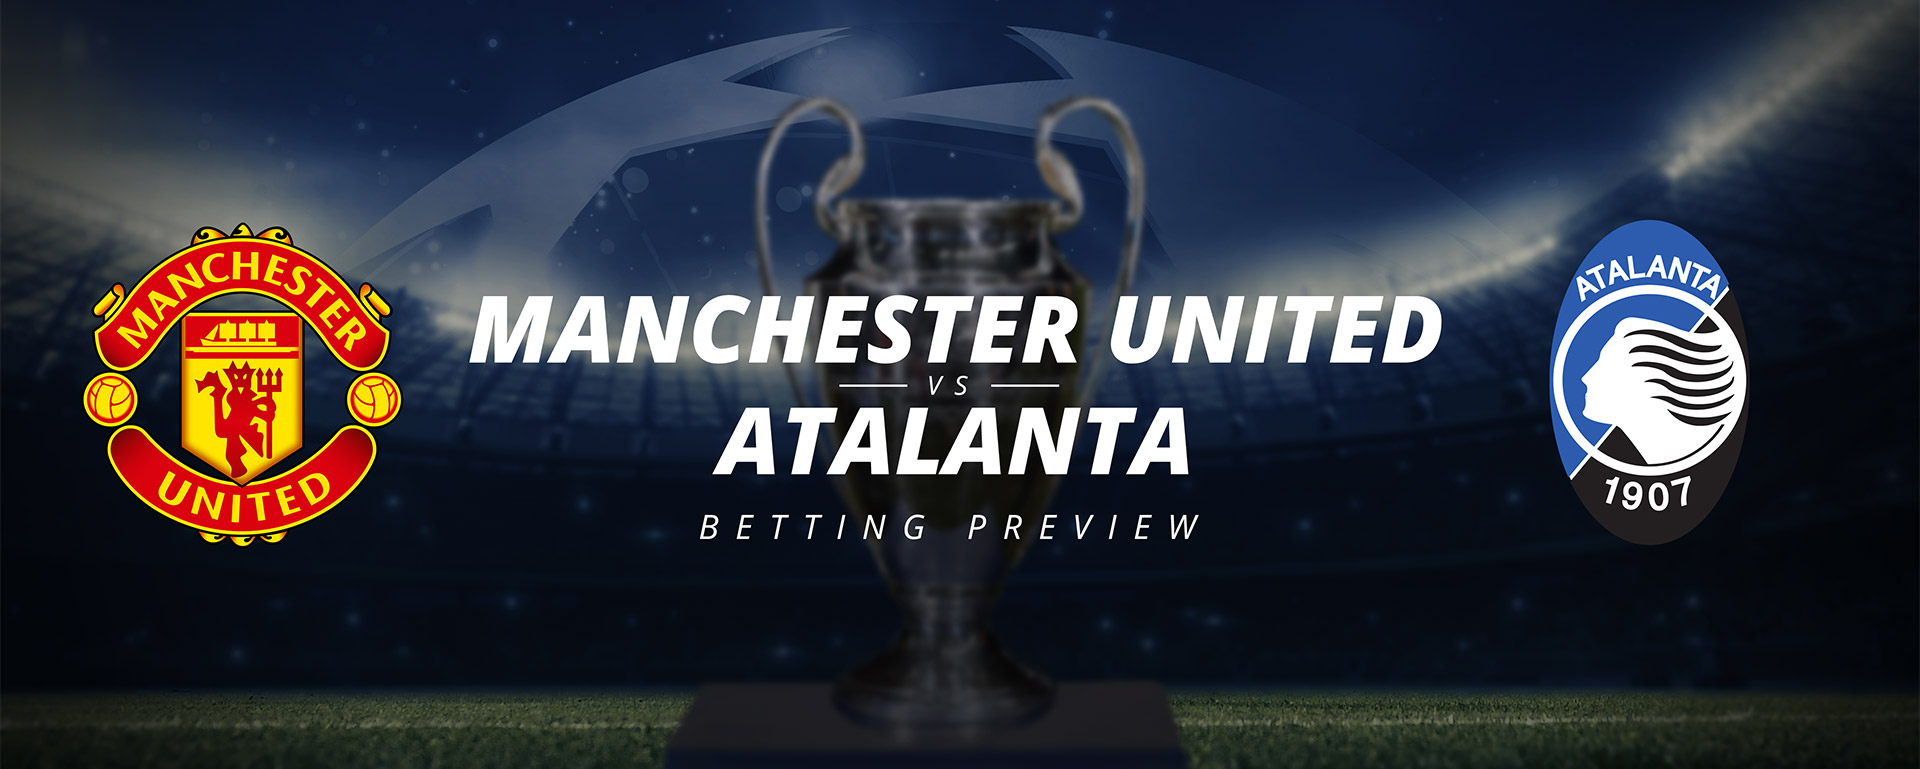 MANCHESTER UNITED VS ATALANTA: BETTING PREVIEW